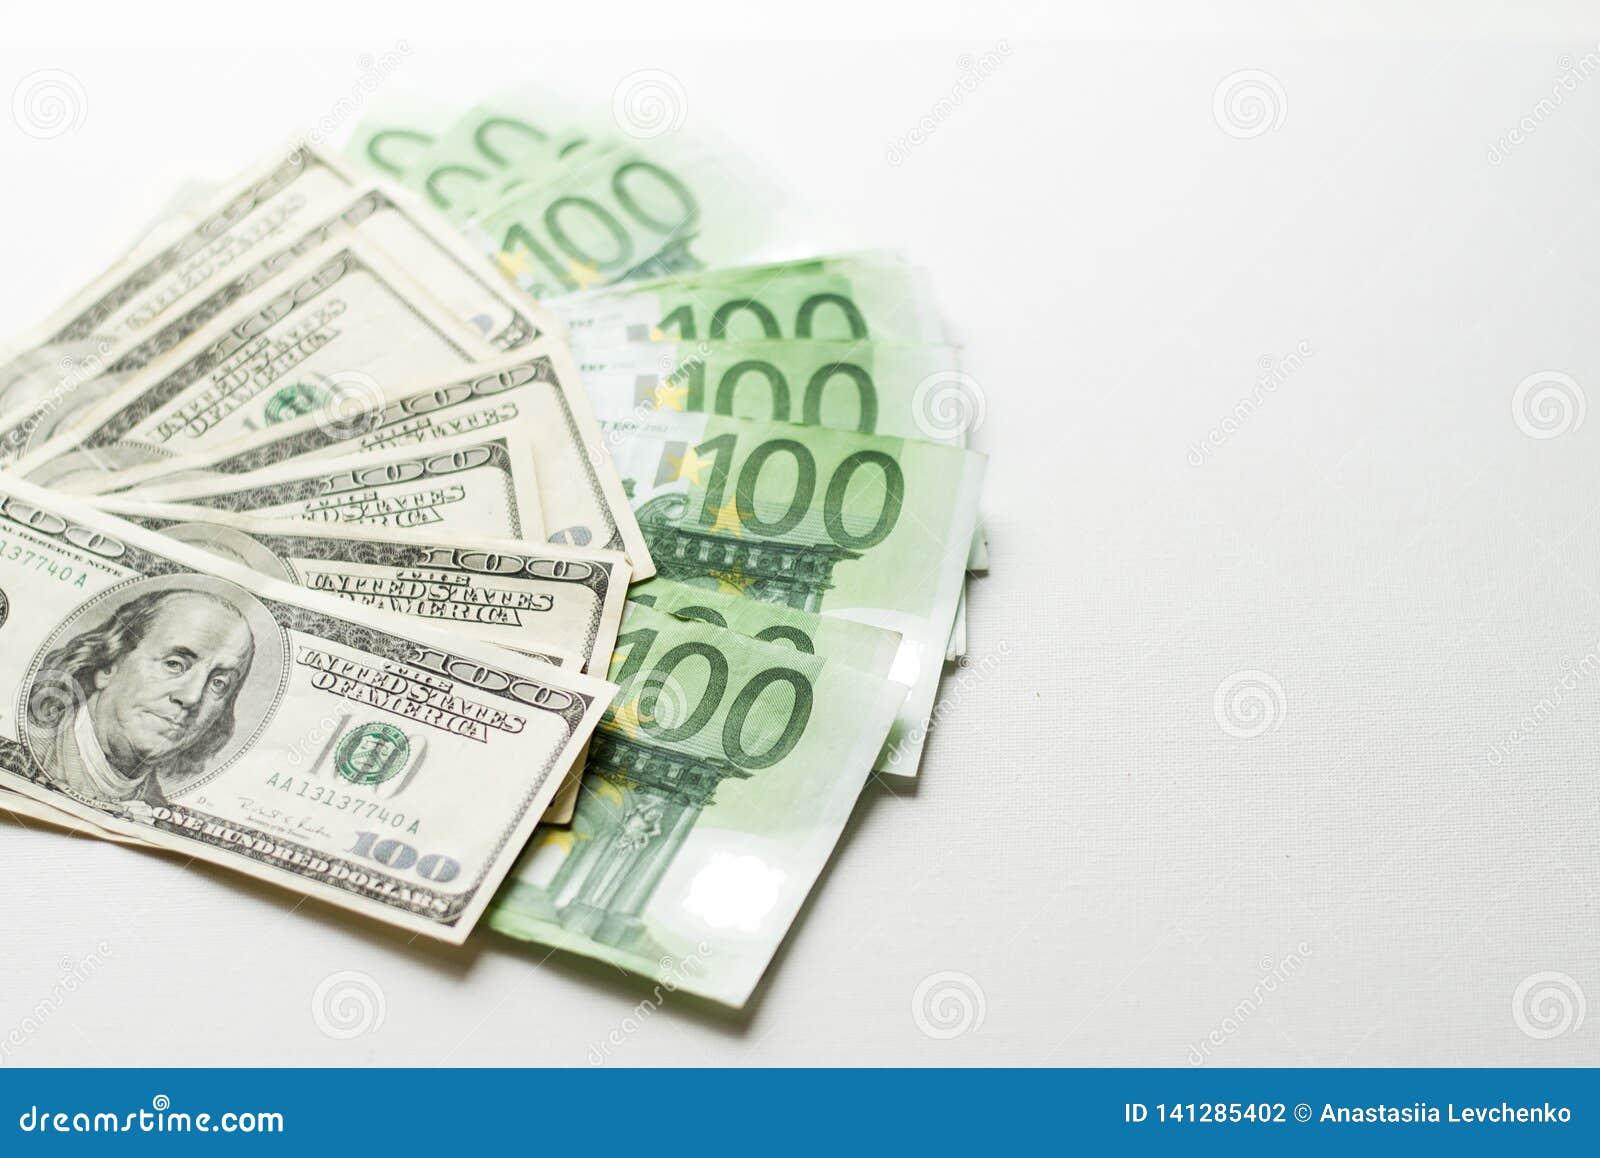 Amerikaanse dollars en euro bankbiljettentextuur witte Achtergrond van dollar honderd en euro rekeningen